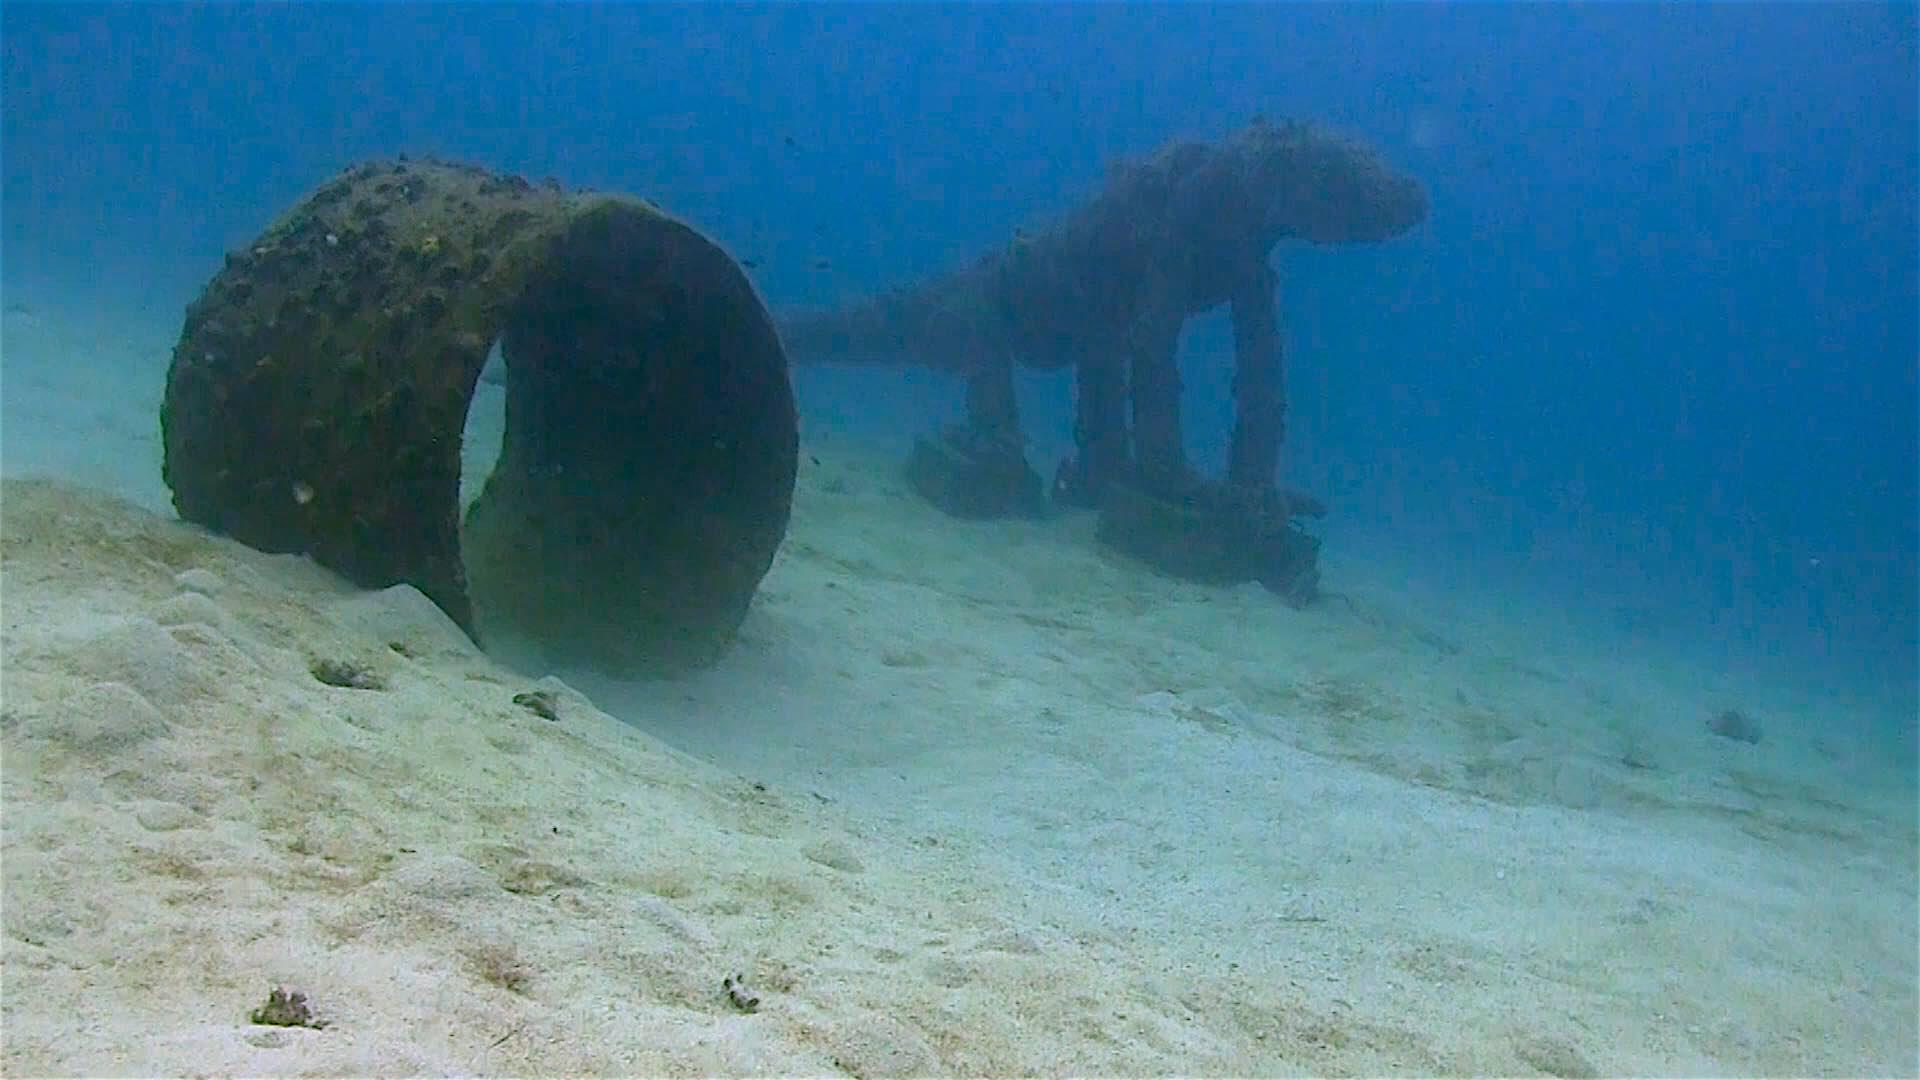 www.thefunkyturtle.com Buoyancy world dive site koh tao underwater